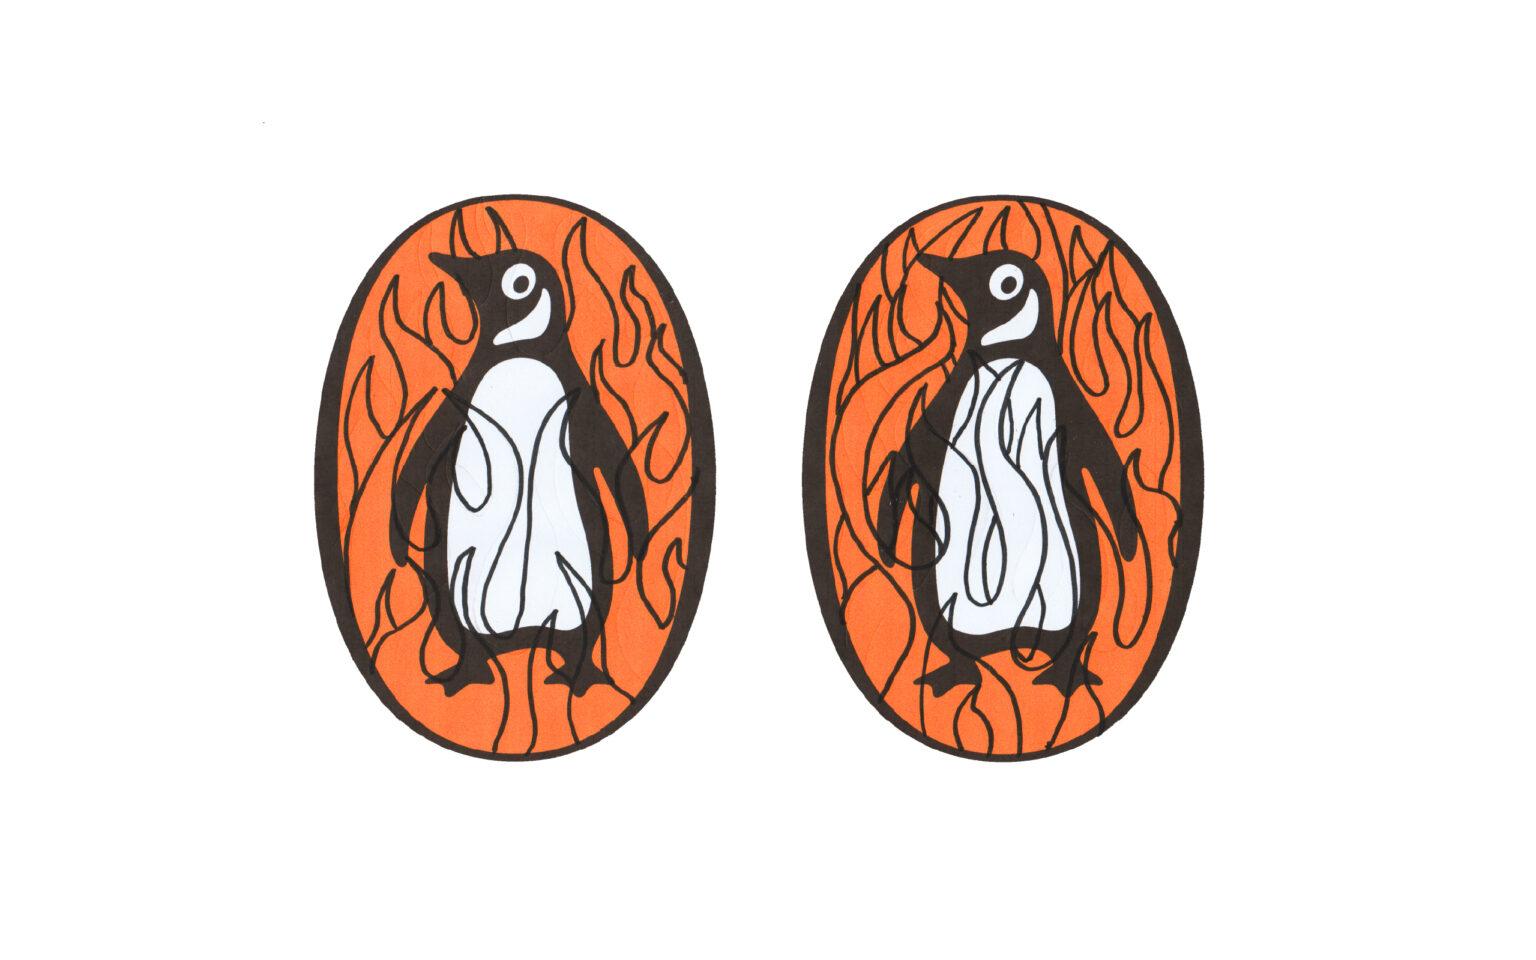 pen drawn flames on top of penguin logos